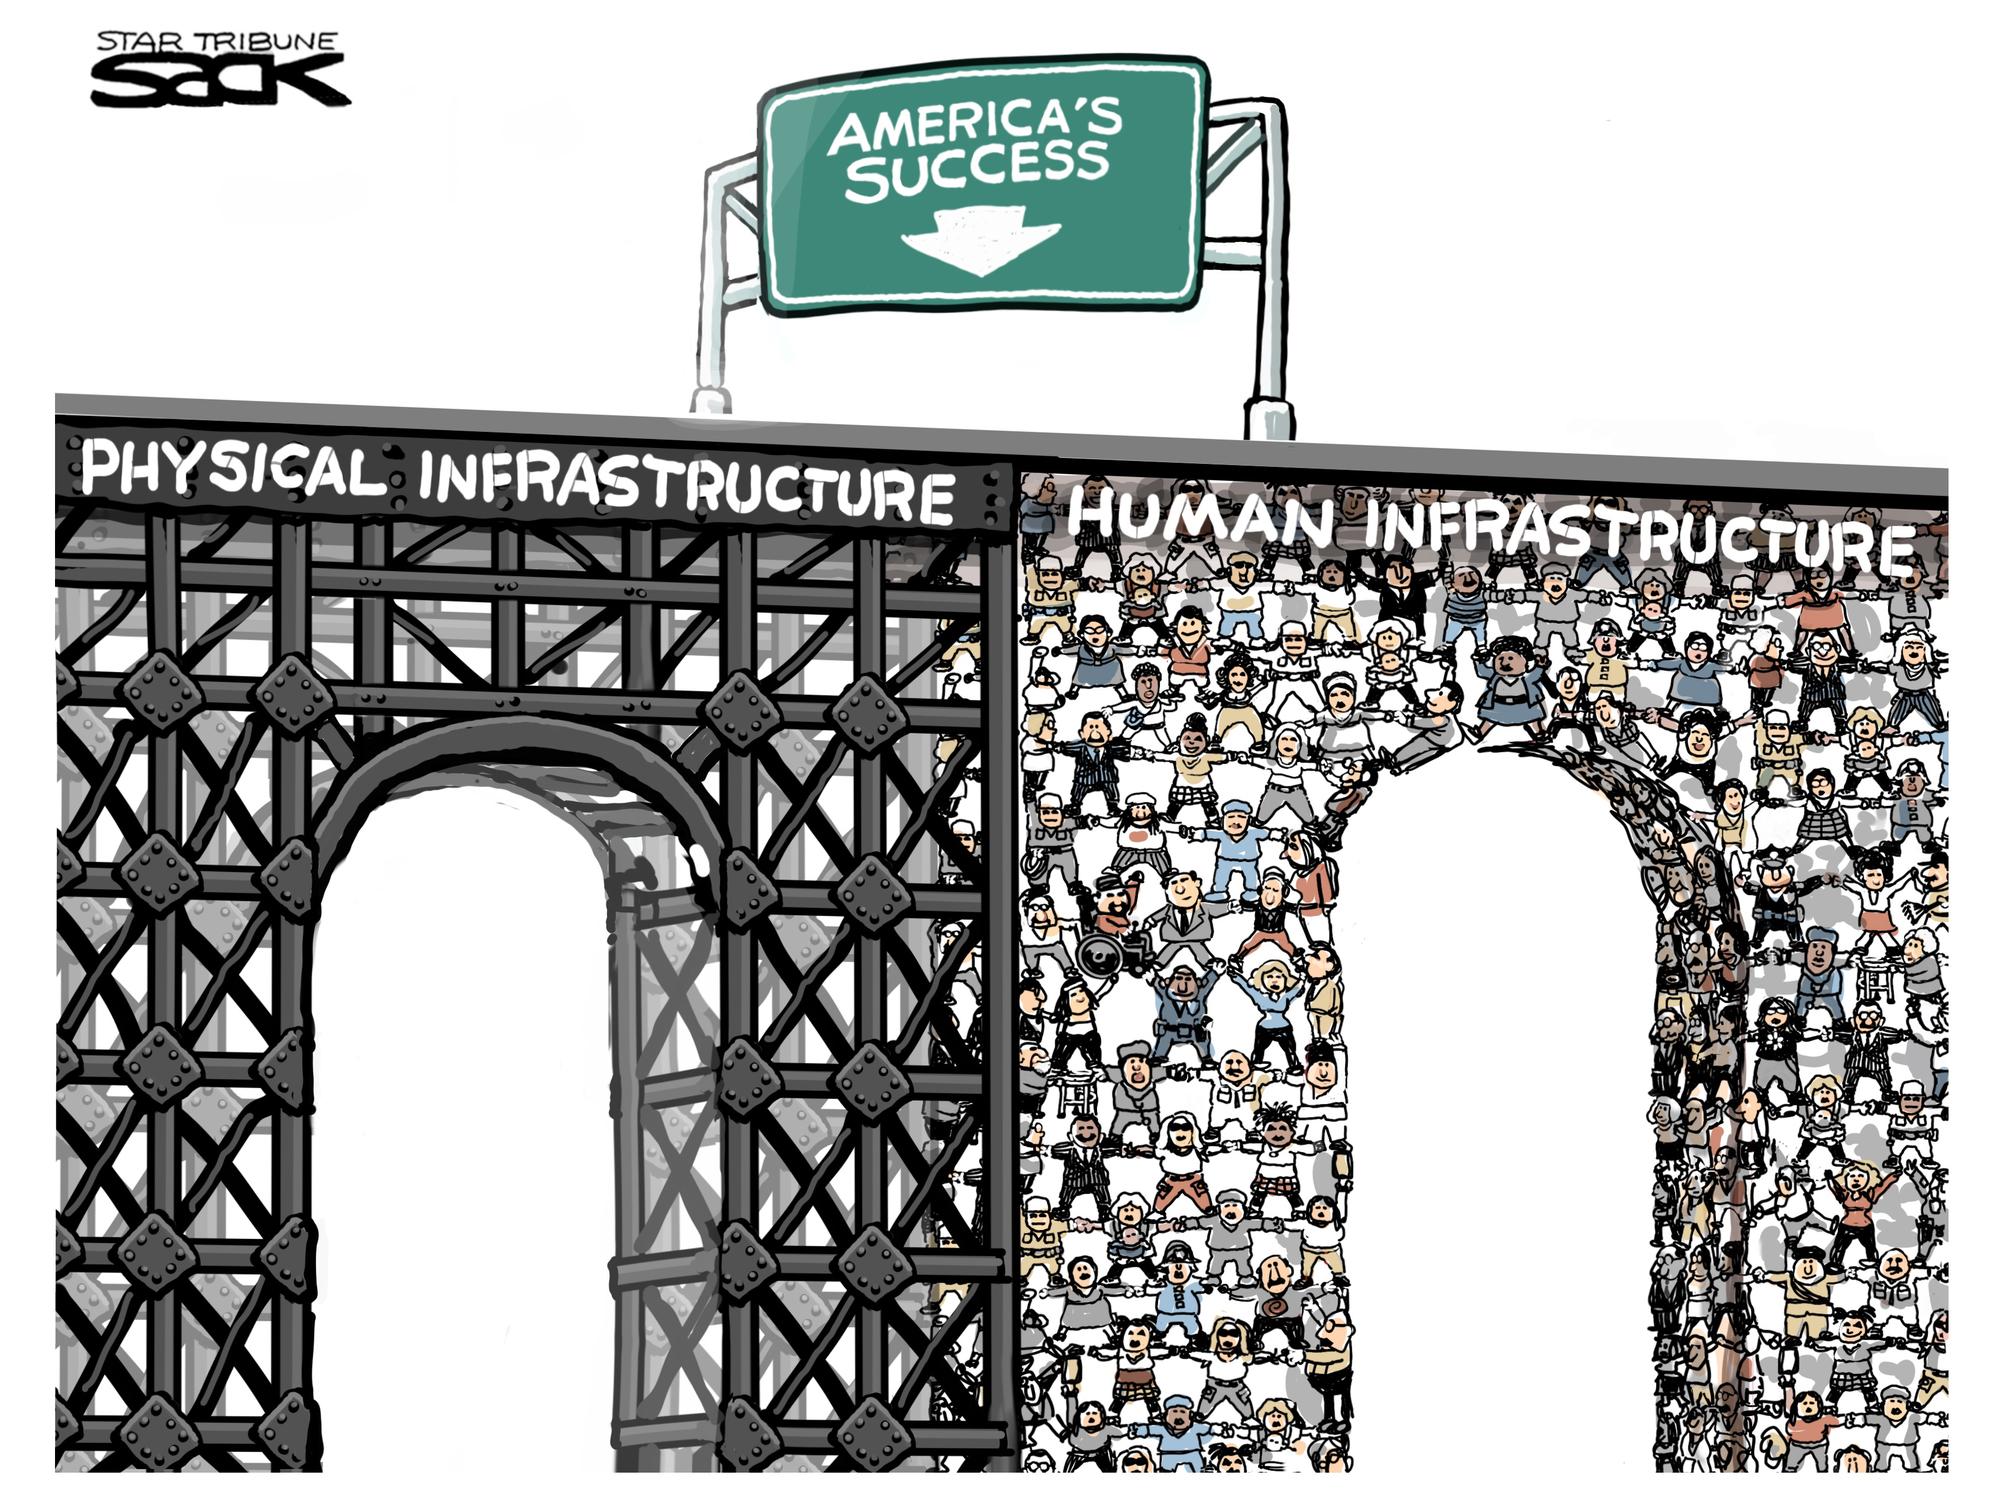 Sack cartoon: America's infrastructure